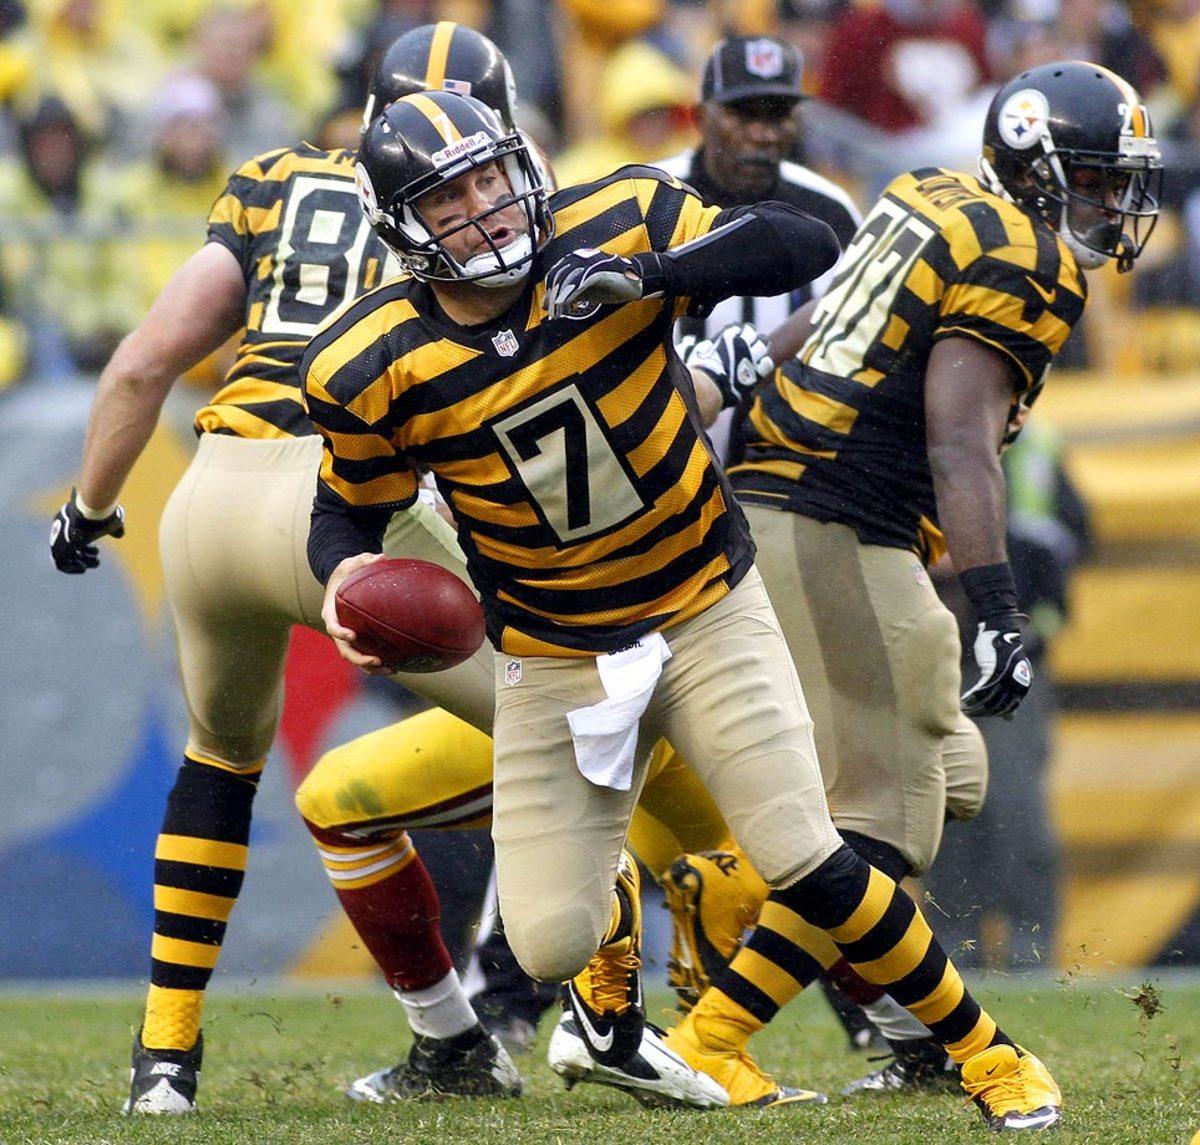 Pittsburgh-Steelers-uniform-2012-Ben-Roethlisberger.jpg